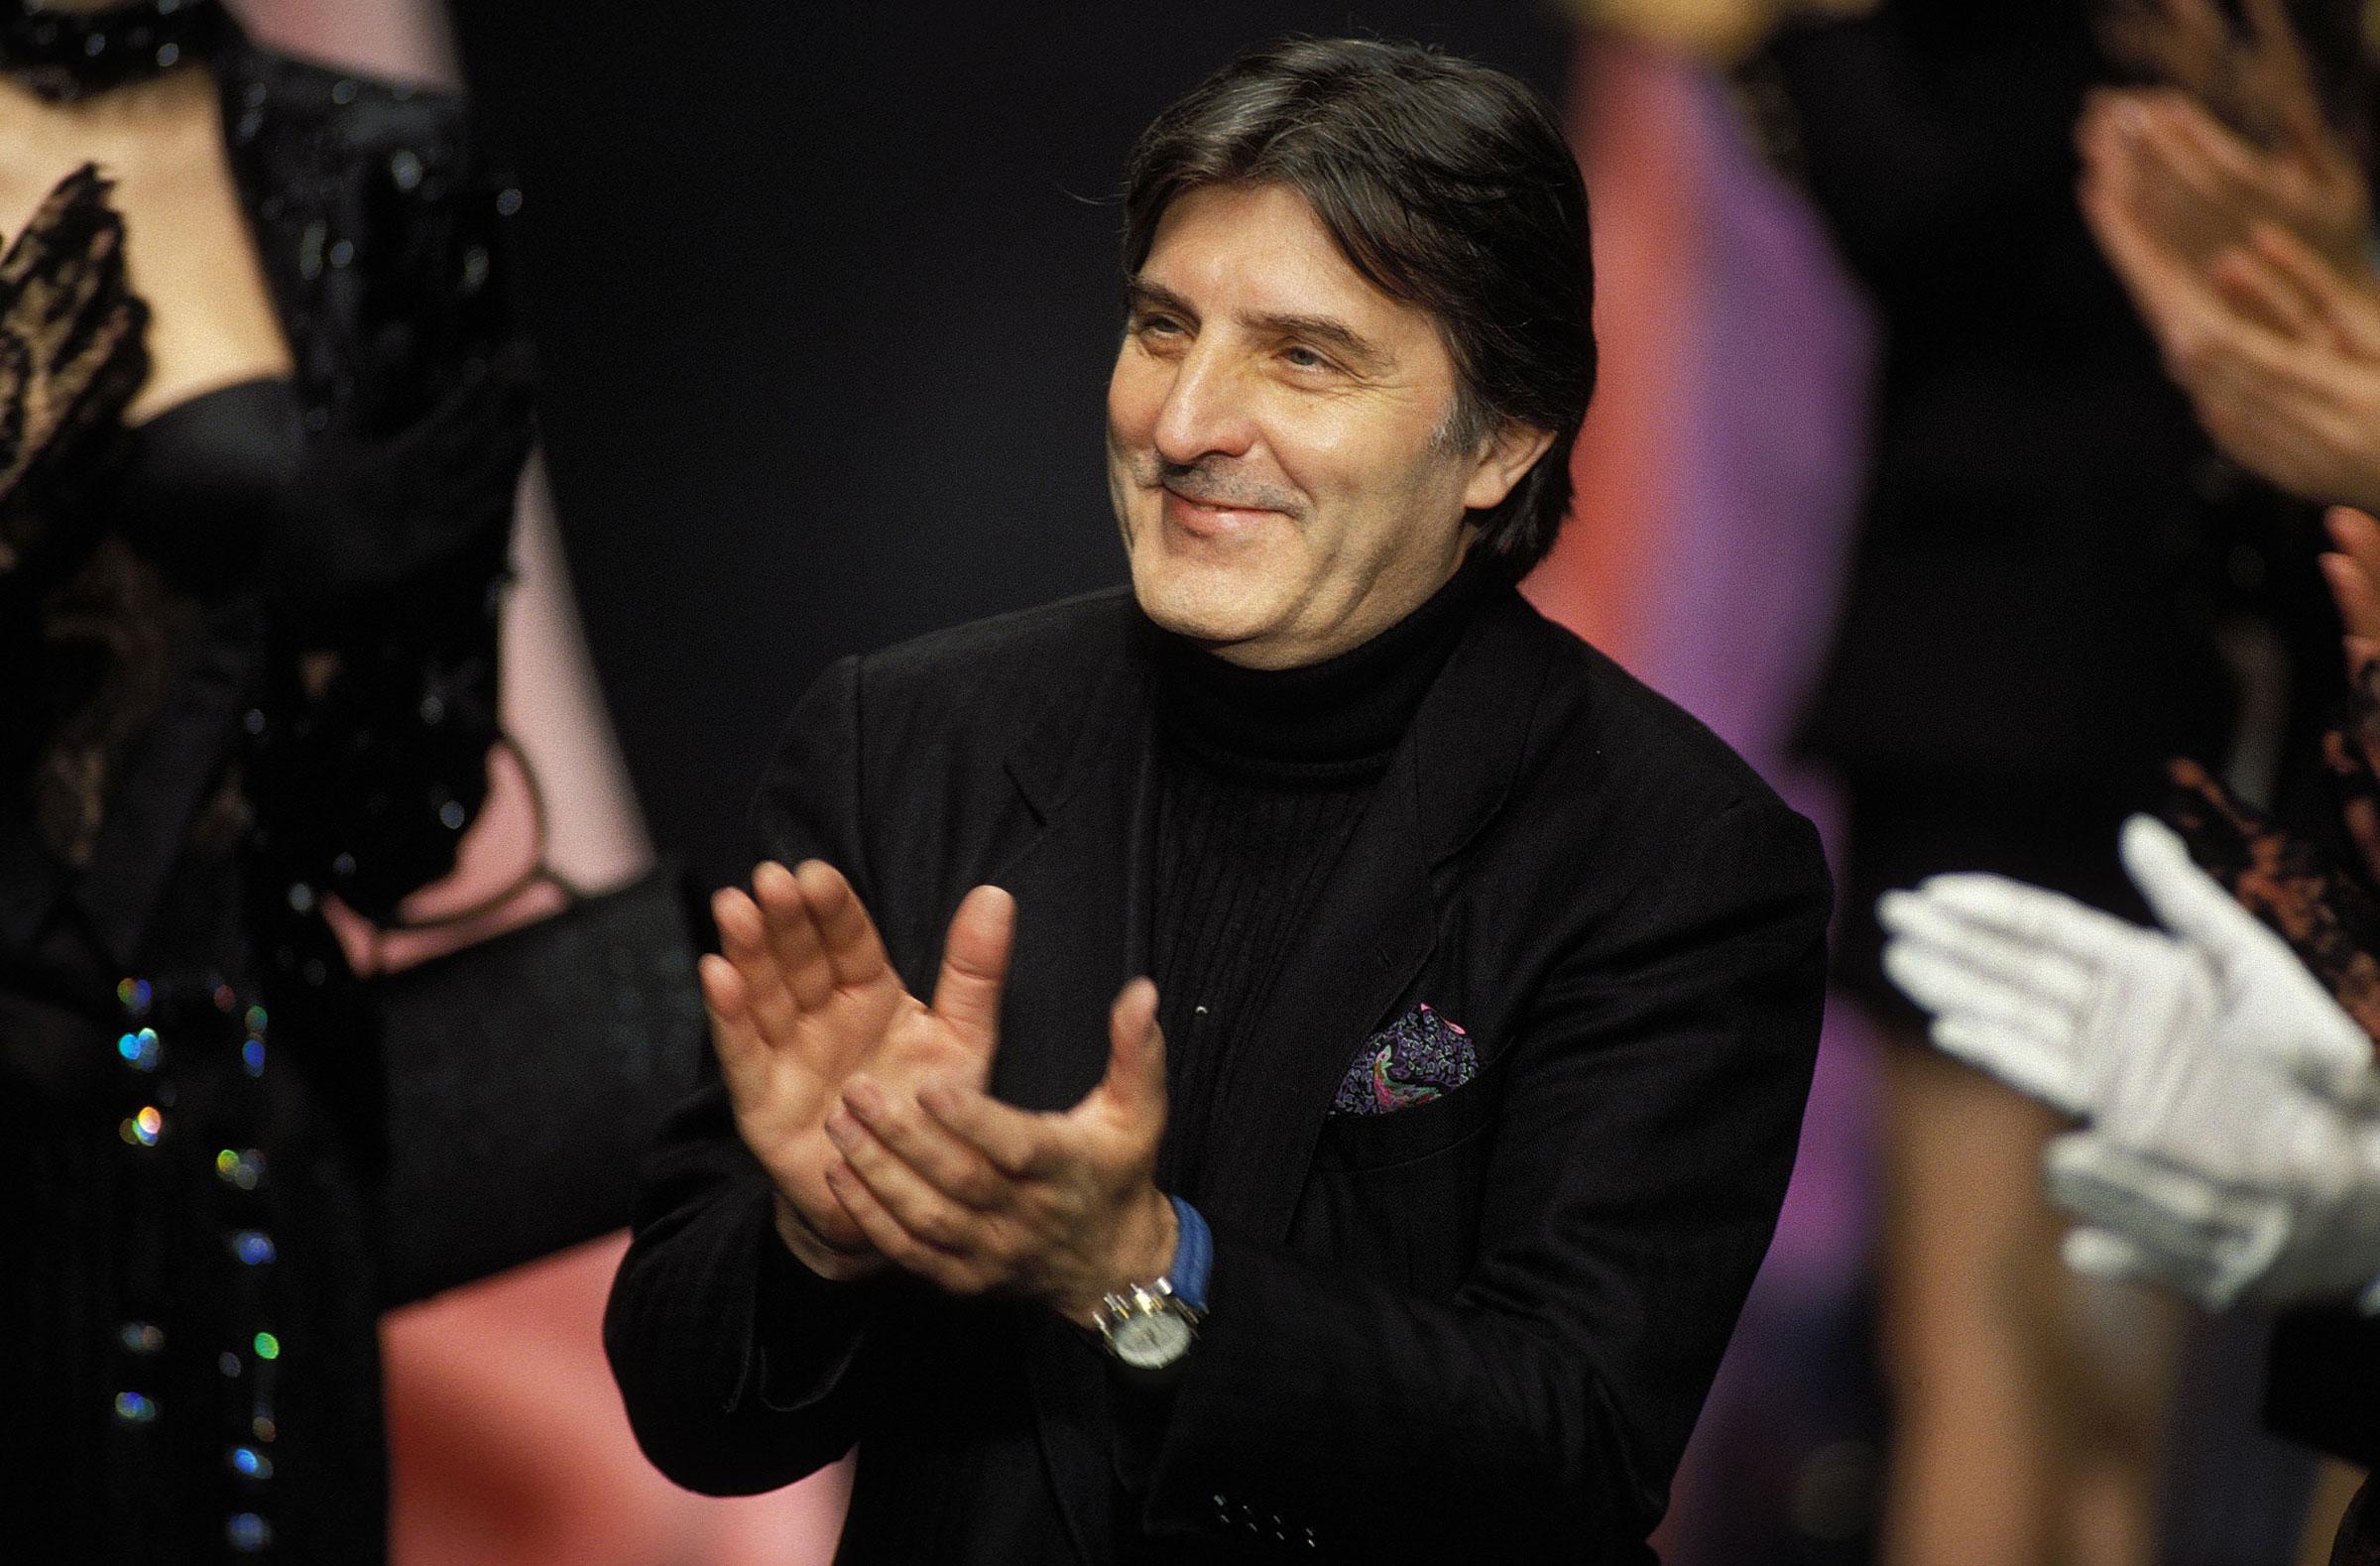 Emanuel Ungaro French Fashion Designer has Died Aged 86